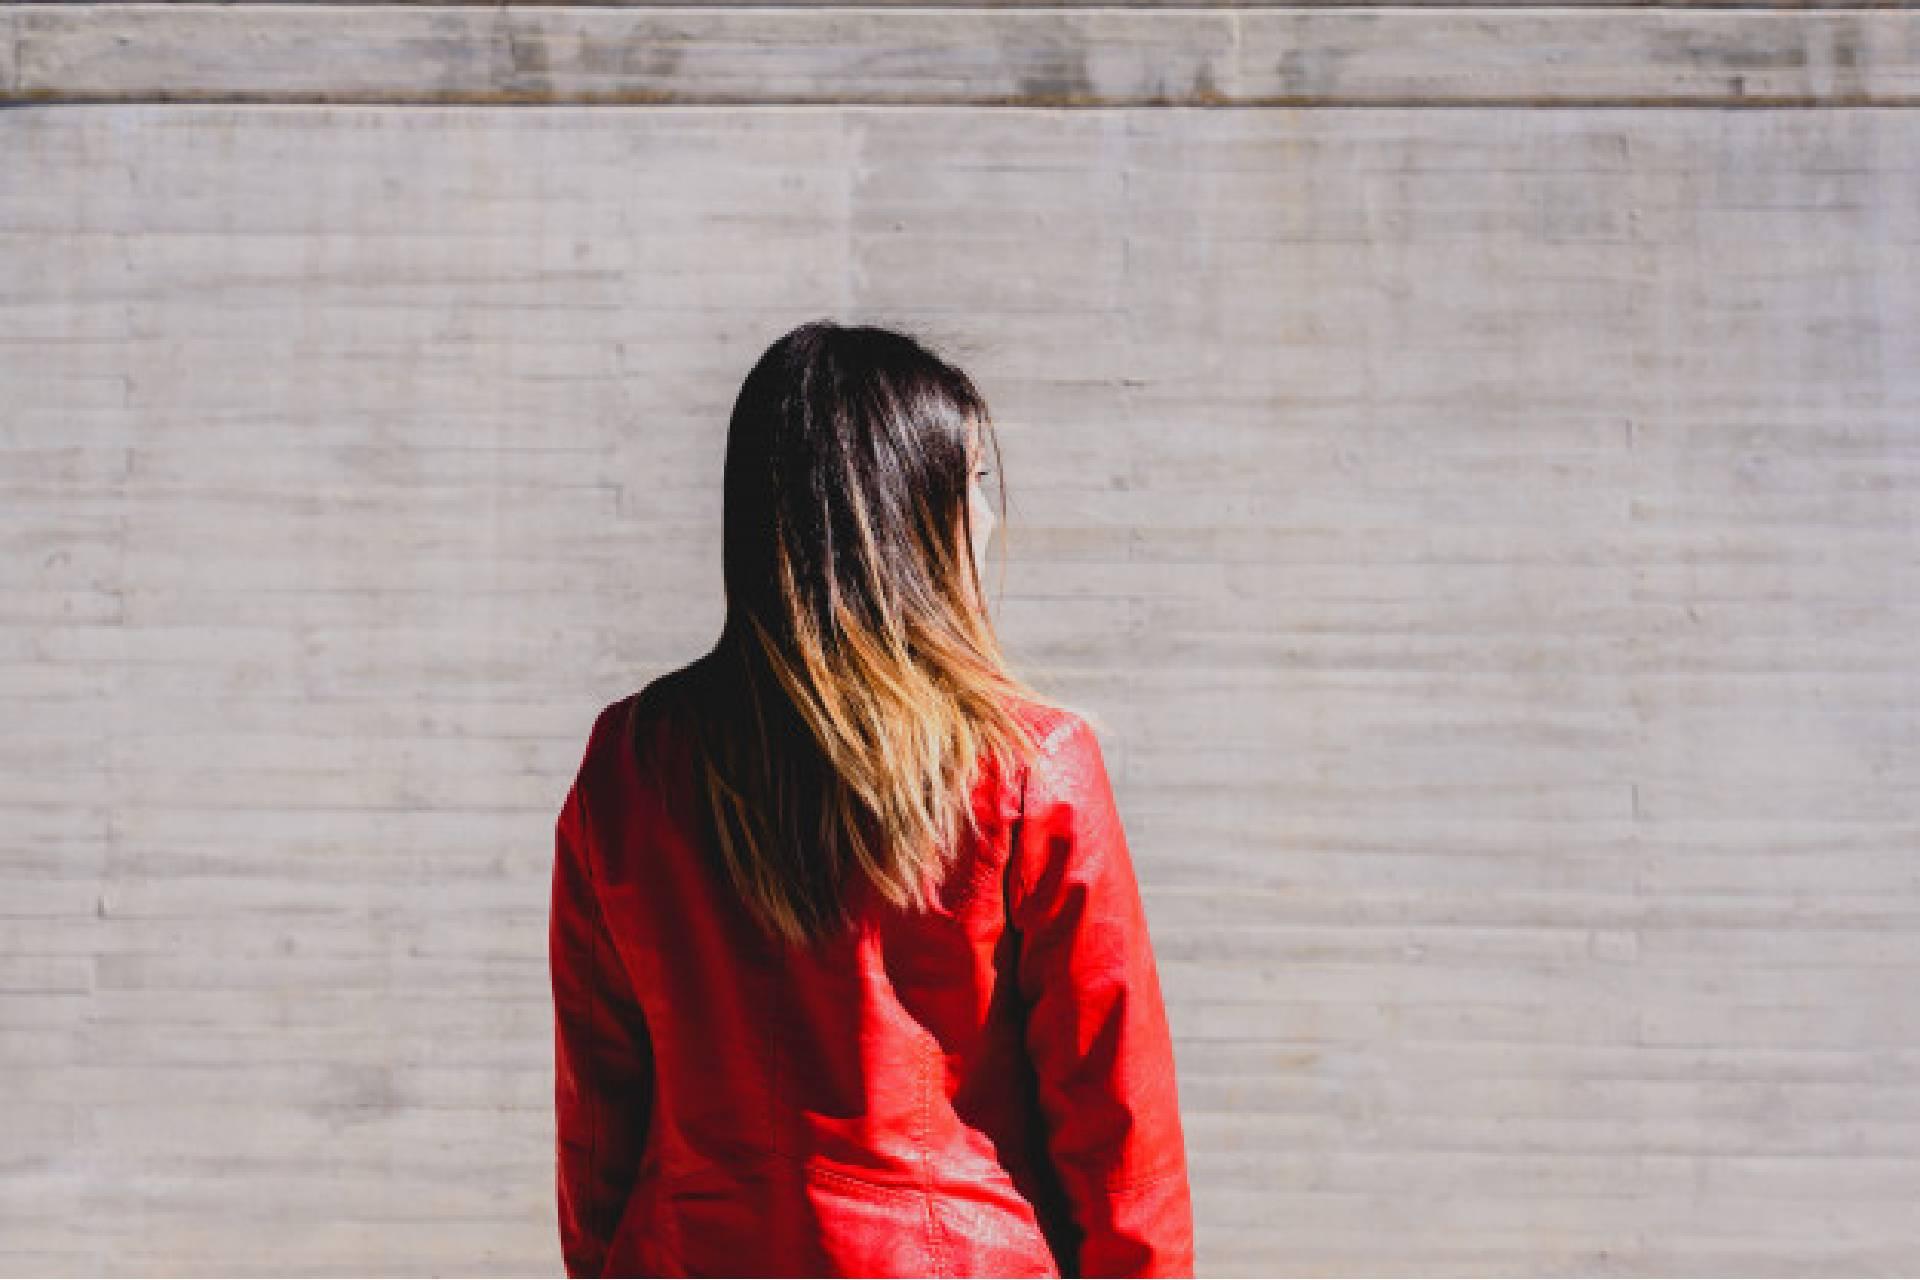 Rocío-Tlaxcala-violencia a la mujer-PJGE